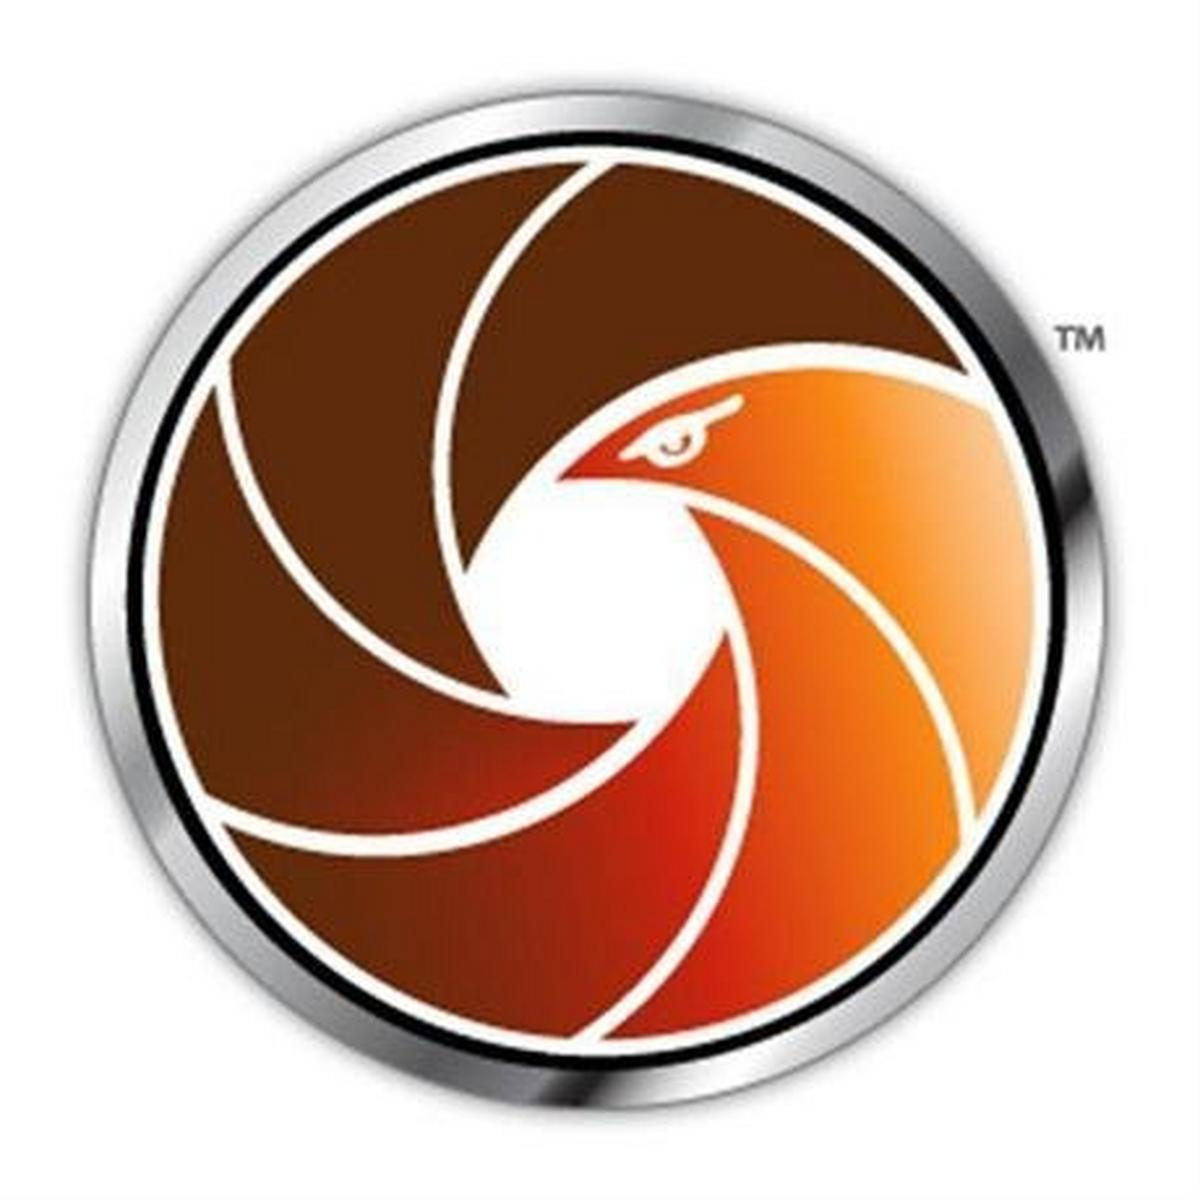 Garmin GPS Spare/Accessory: Birds Eye Select Card